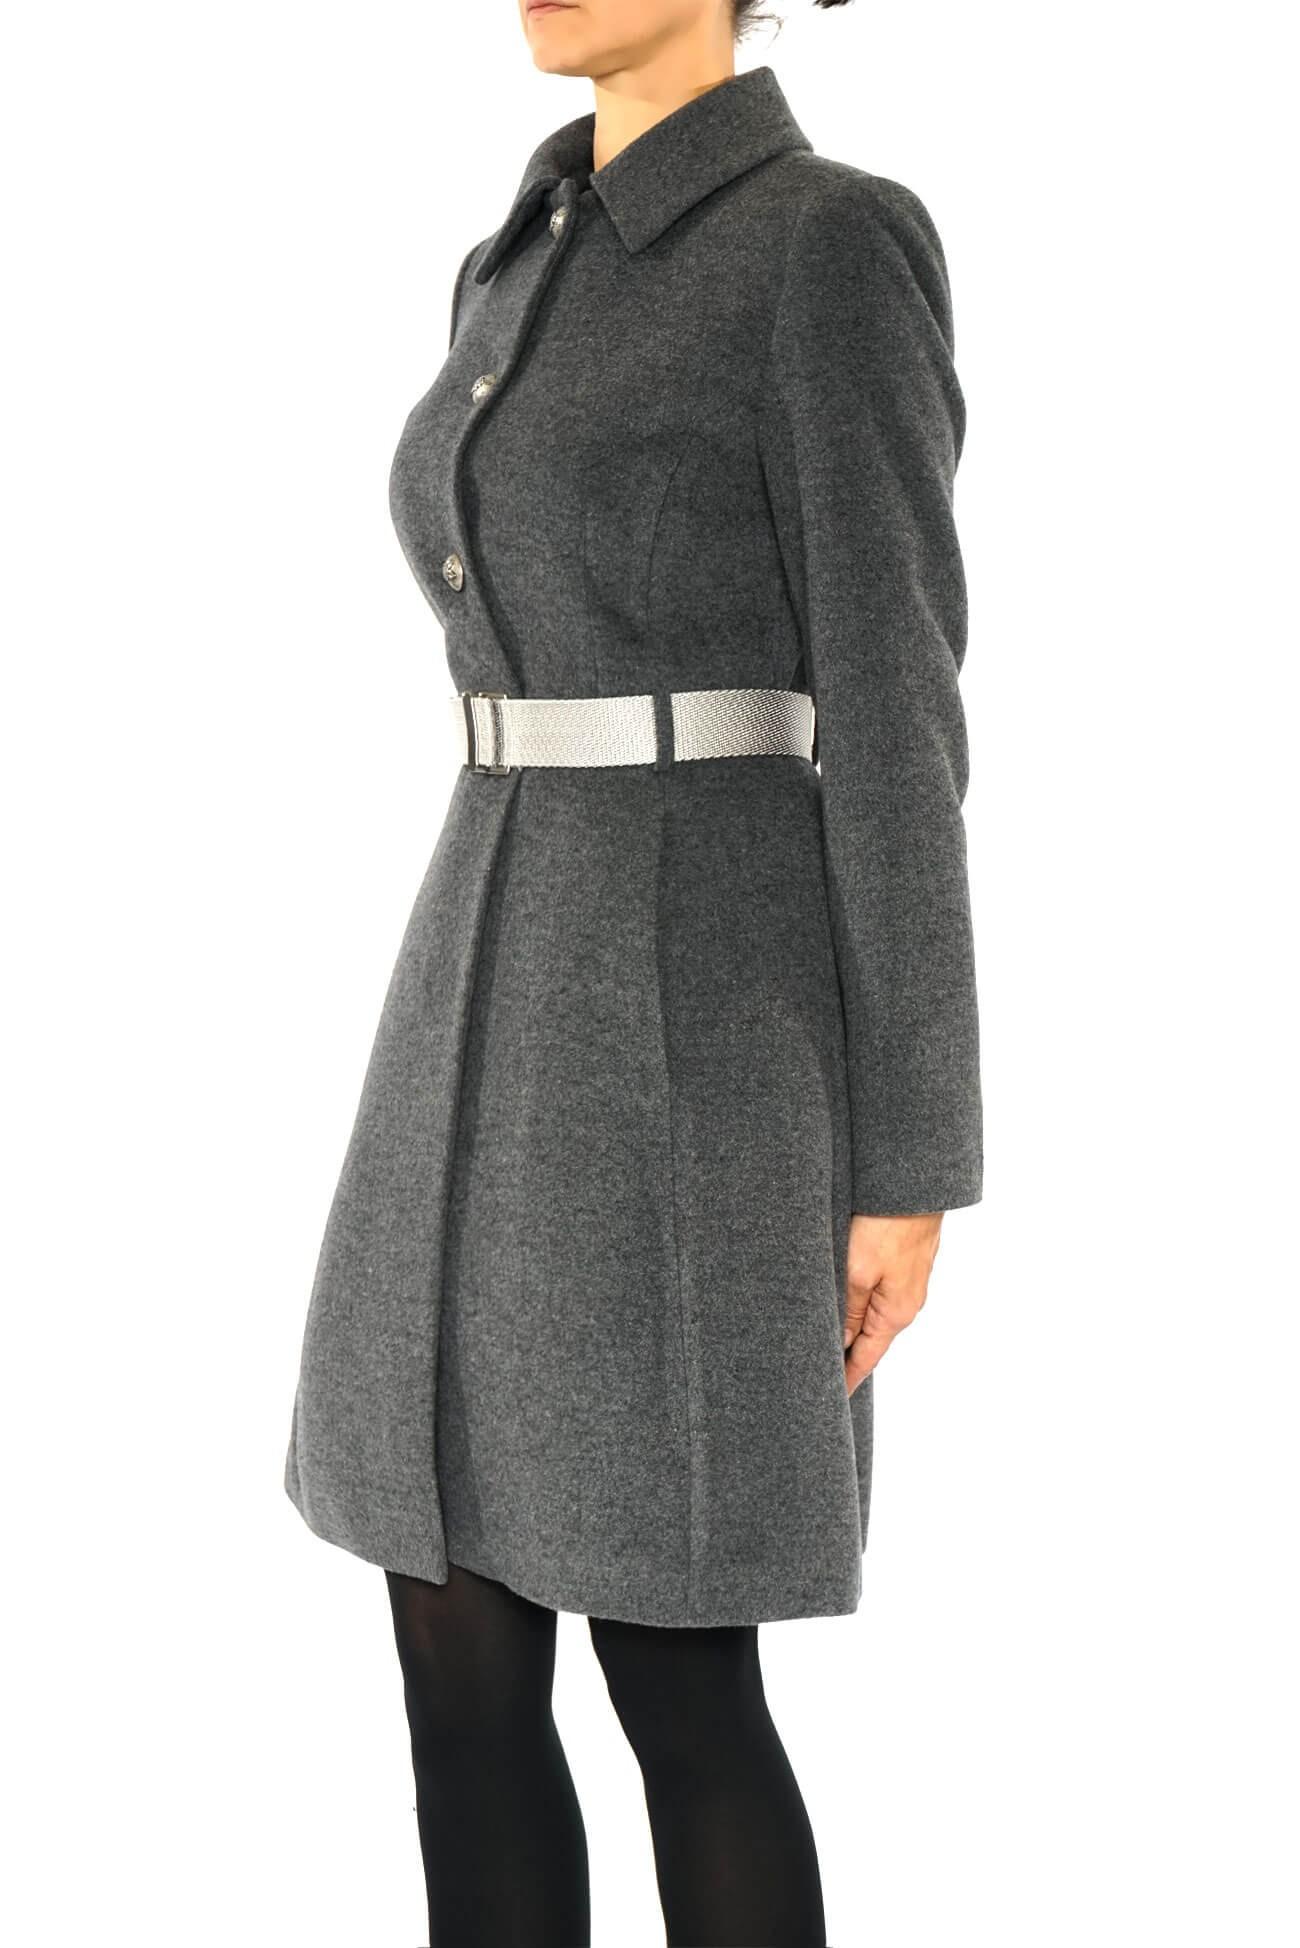 palton din stofa de lana taiat in talie